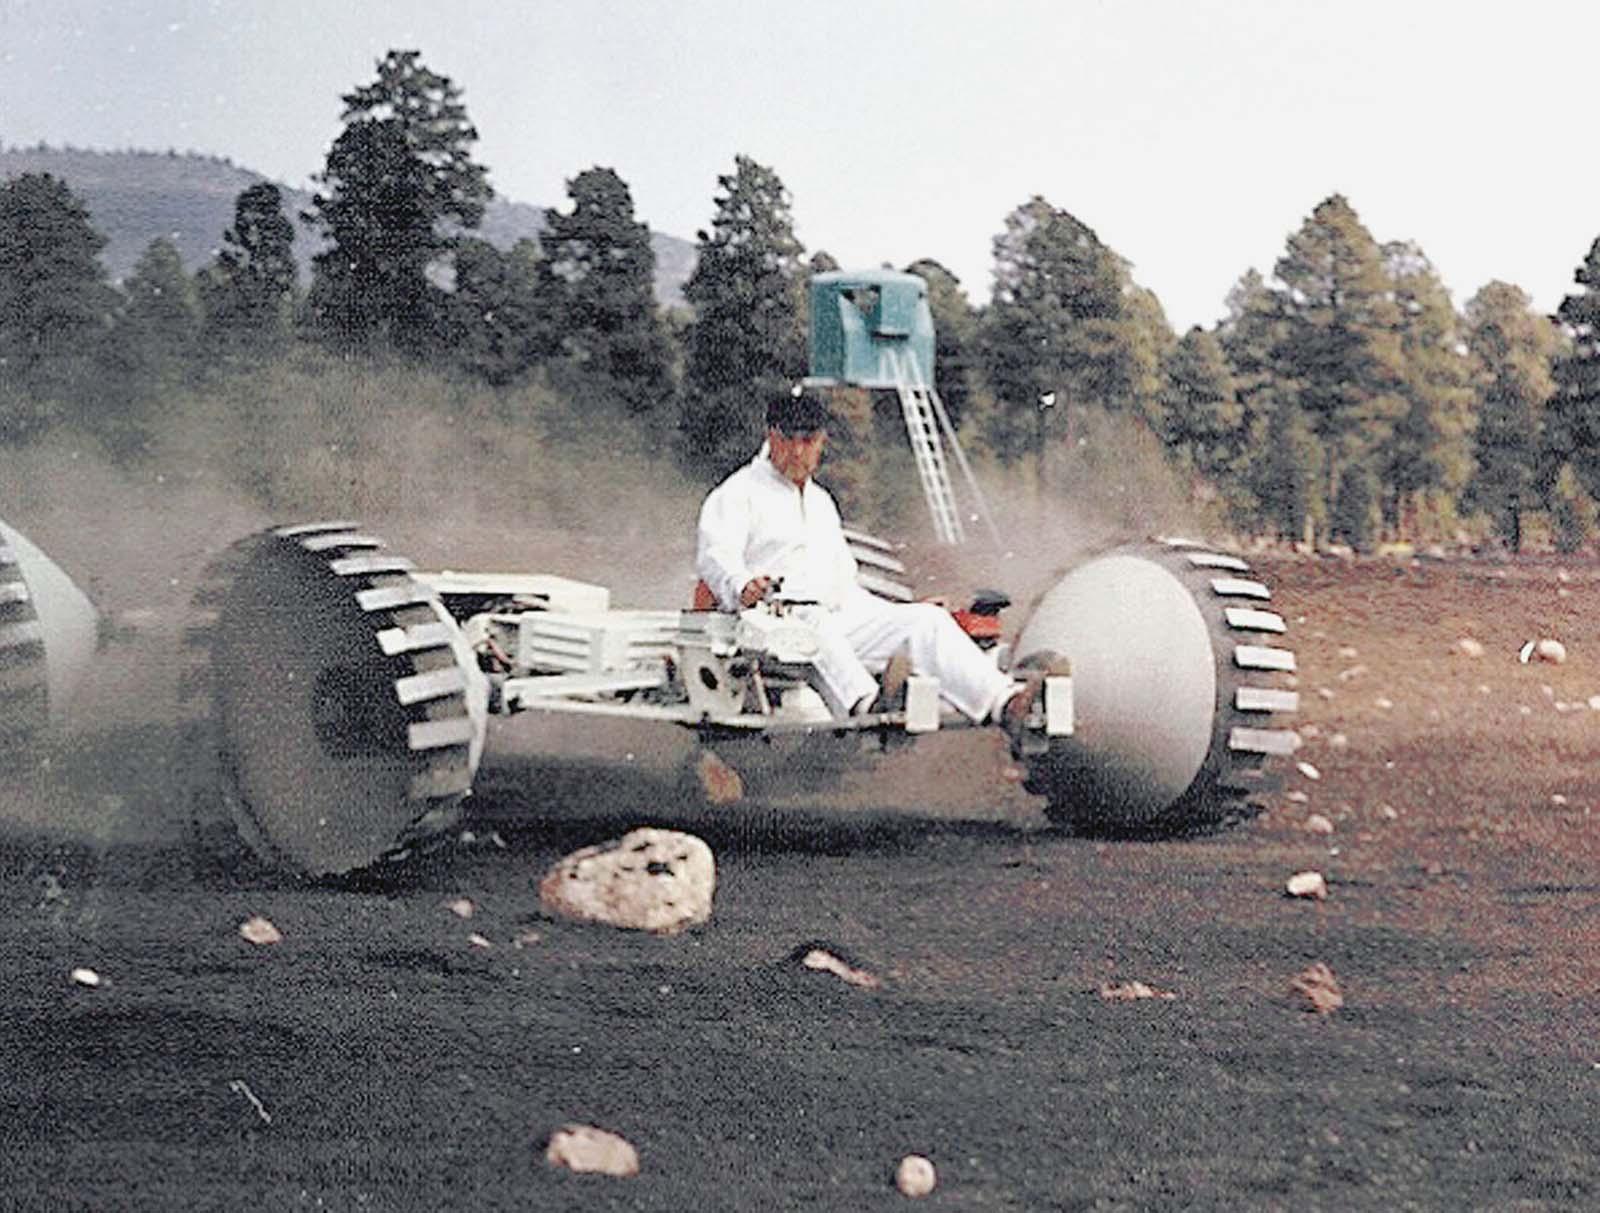 A Grumman Aircraft Engineering Corporation lunar-rover concept vehicle navigates boulders with a Grumman engineer driving.